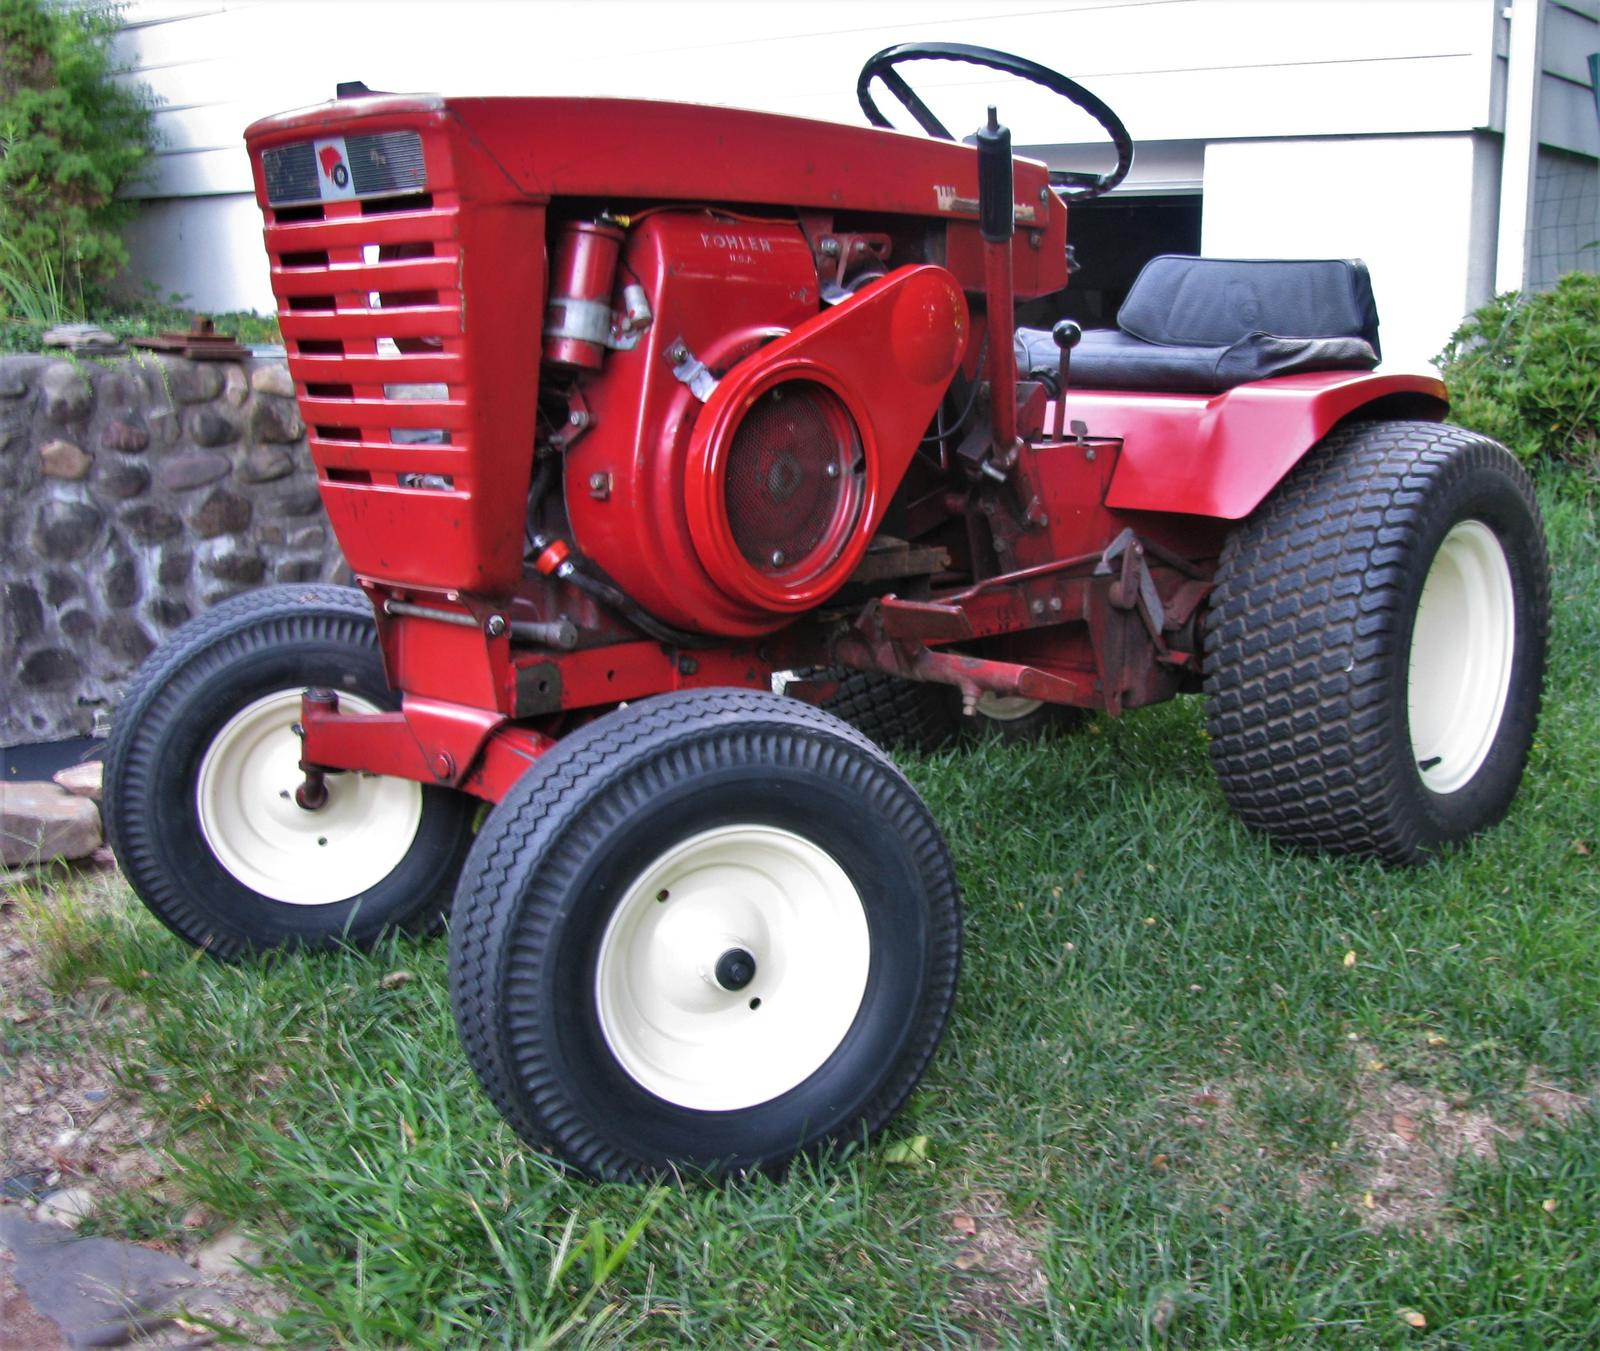 '66 Model 1056-3